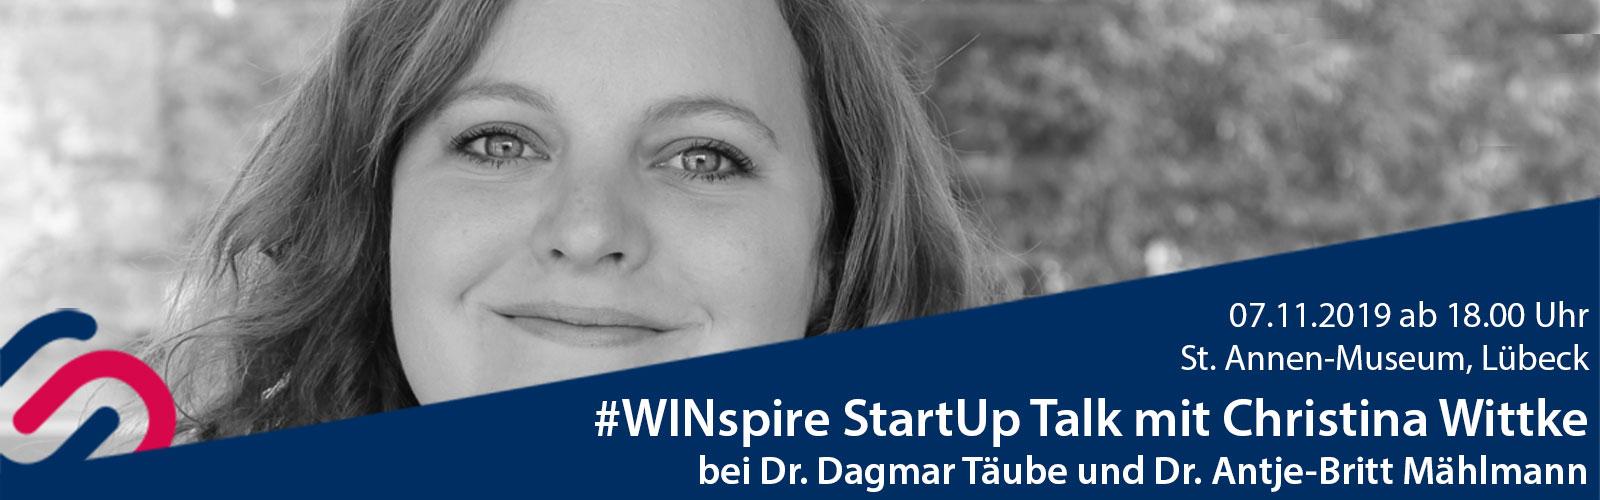 #WINspire StartUP Talk @ St. Annen-Museum